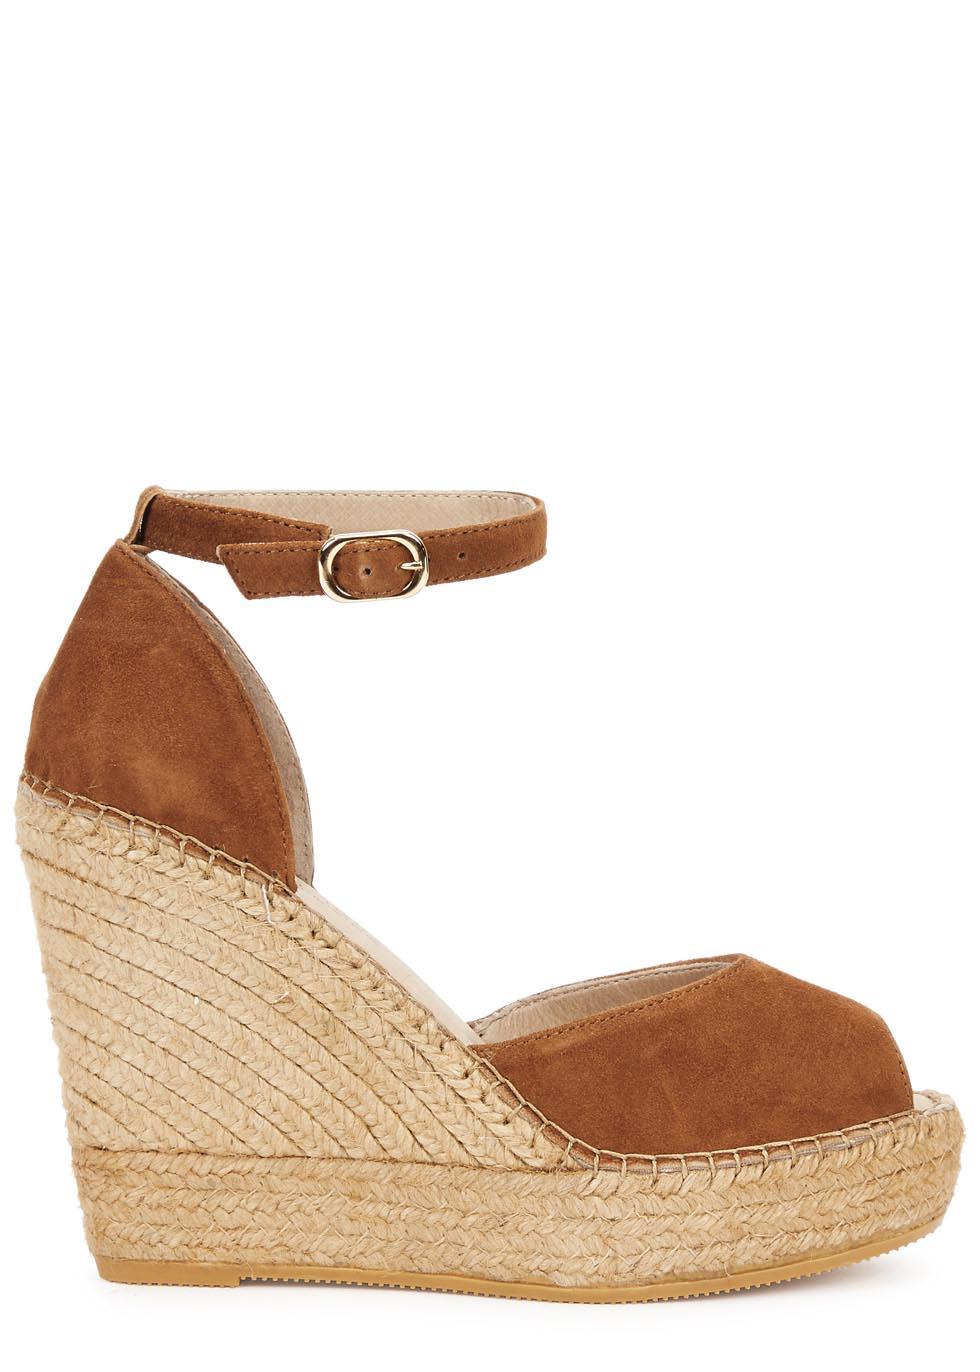 7d9e68e928f Macarena Sara Brown Suede Wedge Sandals in Brown - Lyst